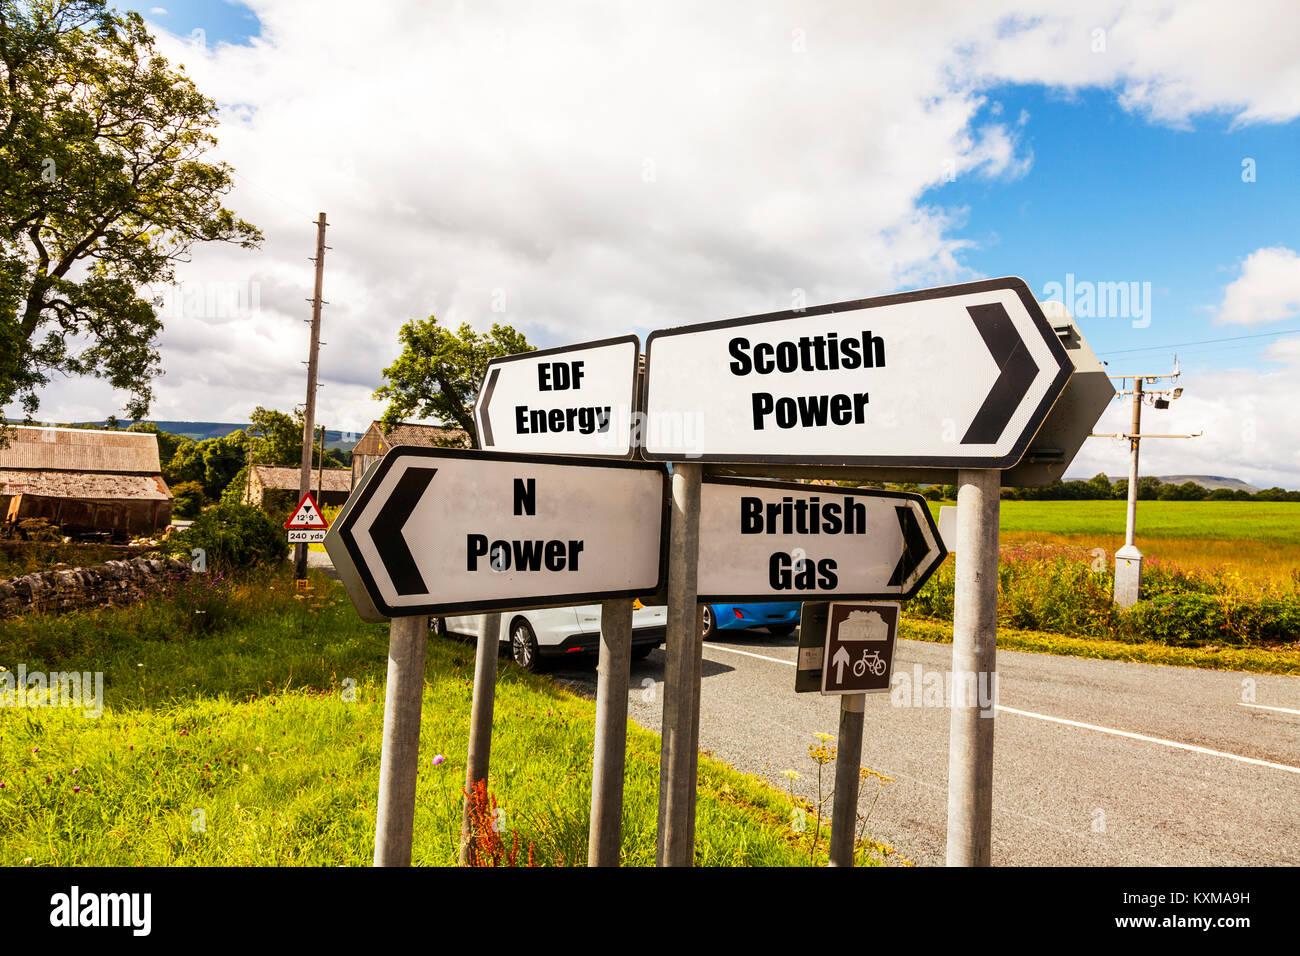 UK power companies, Scottish Power, N Power, EDF Energy, British Gas, energy providers UK England, electric company, - Stock Image